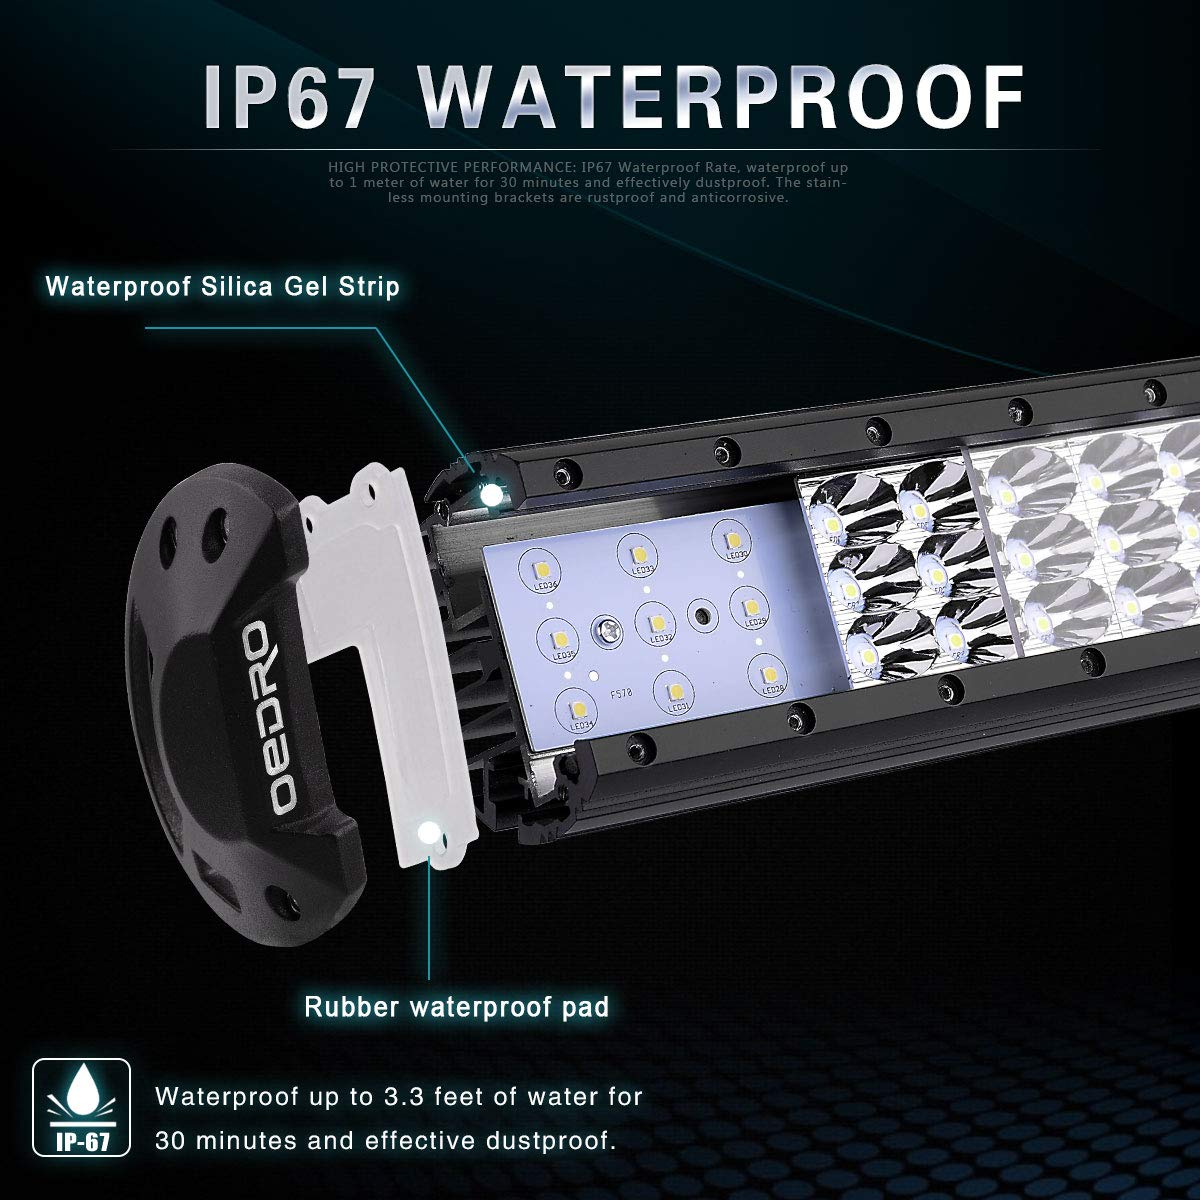 LED Light Bar Wiring Harness OEDRO 189W 20Inch Tri-Rows LED Light Pod Spot Flood Combo Light Off Road Lights Led Fog Light Truck Light Boat Lighting for Truck Pickup Jeep SUV ATV UTV,3 Years Warranty BO05-F03-x1l